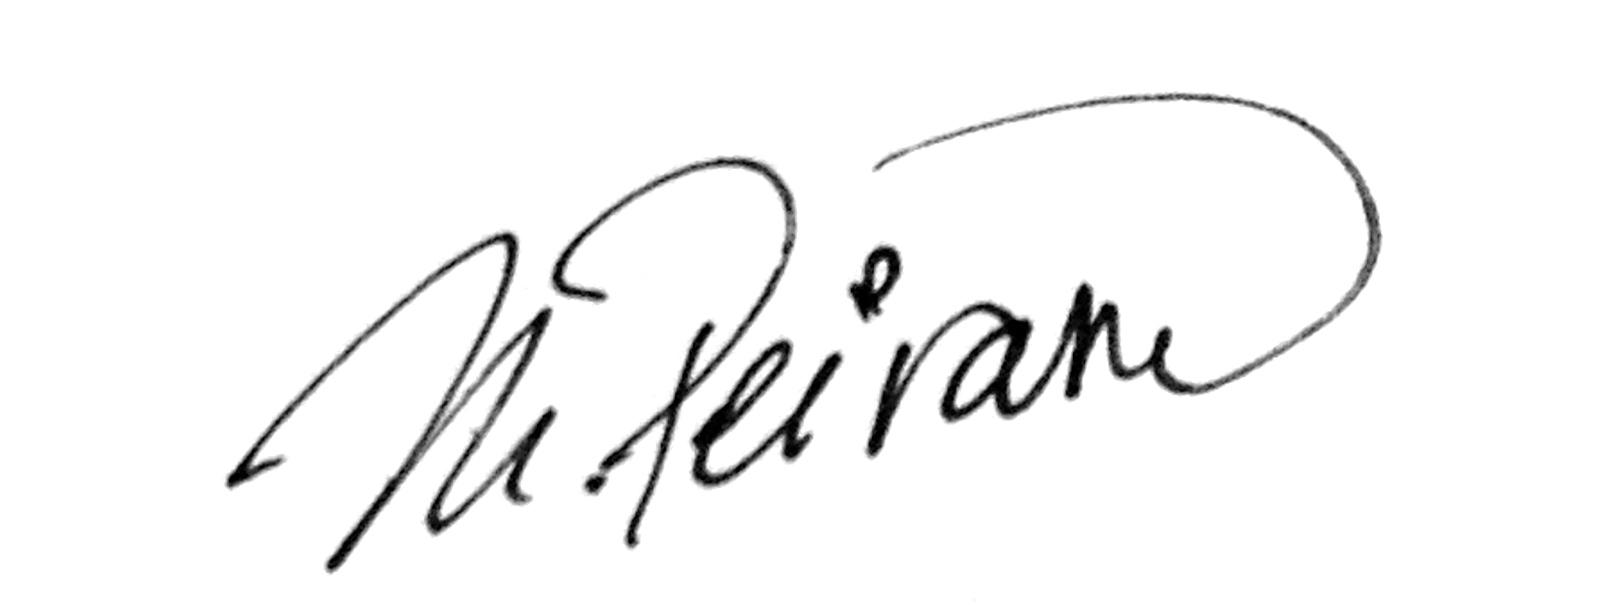 Mariana Peirano Signature